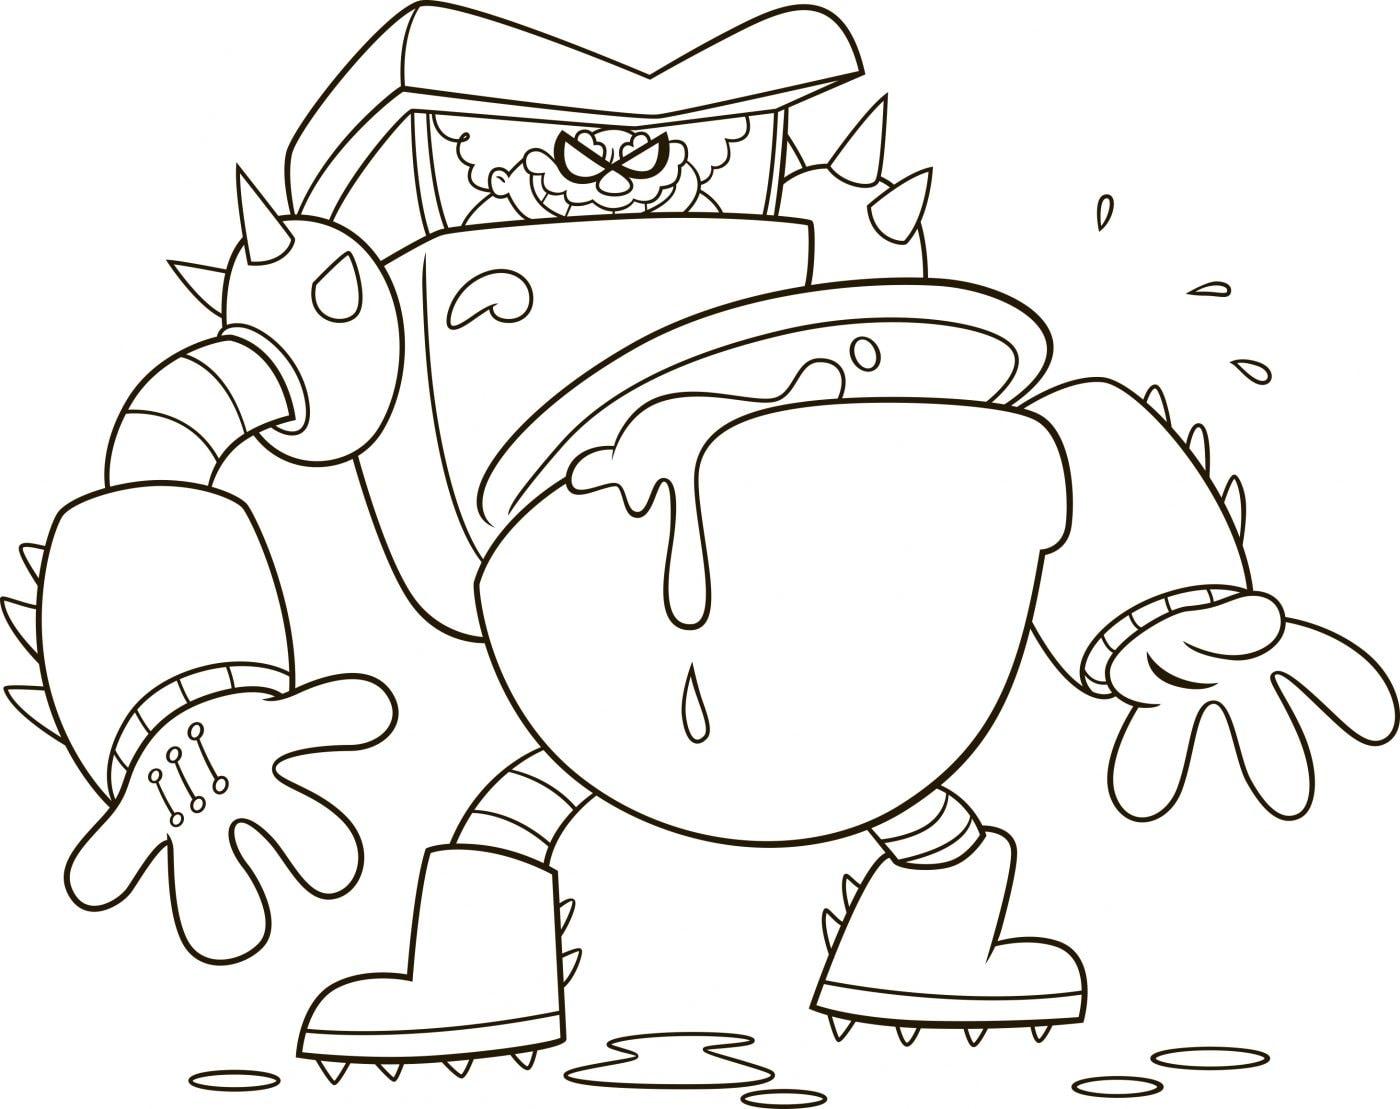 Captain Underpants Turbo Toilet 2000 Coloring Page